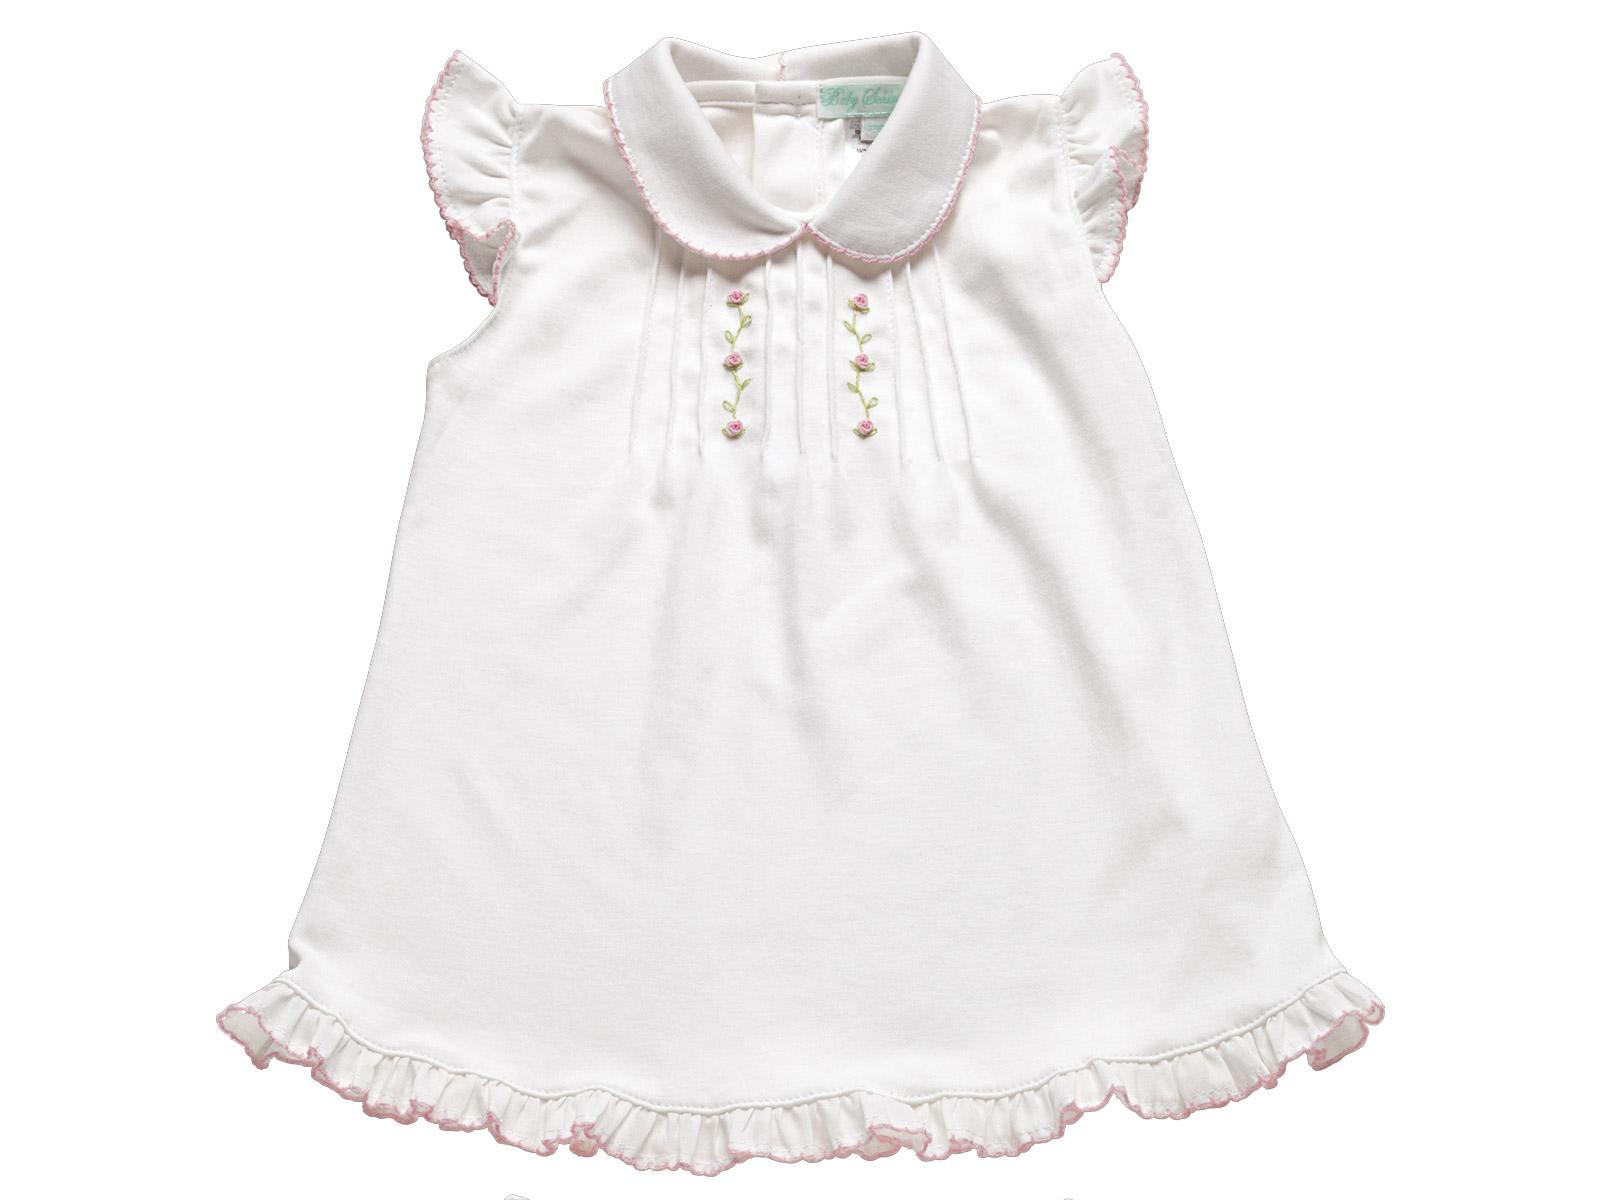 Baby-Aria_RuffledDress_Pink_4795.jpg